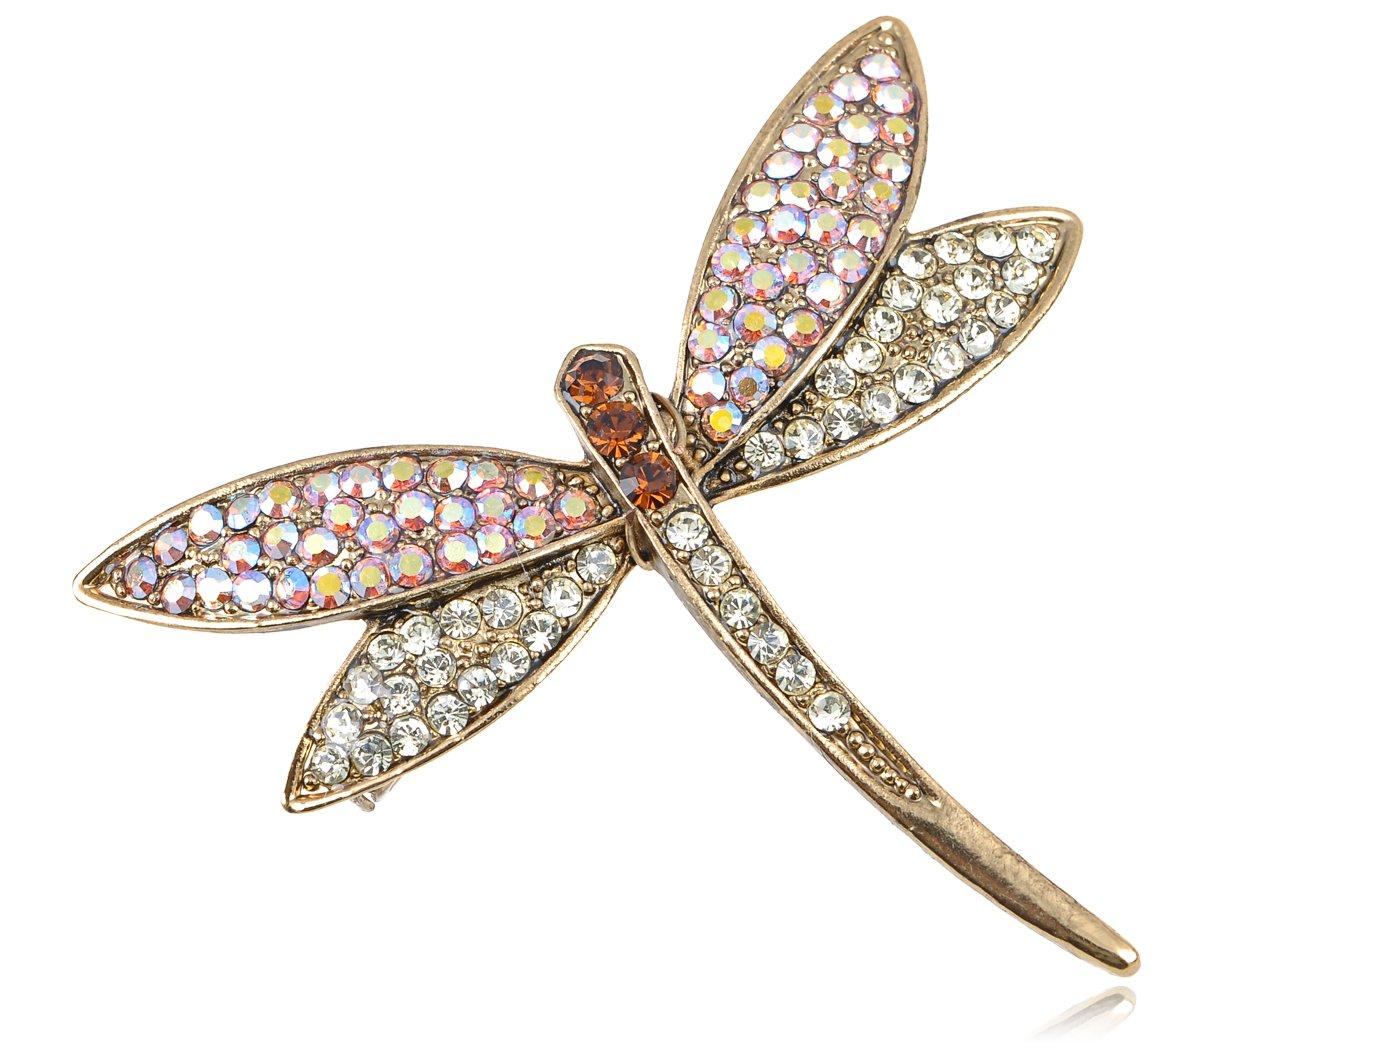 Alilang Golden Tone Iridescent Multi Rhinestones Colorful Dragonfly Brooch Pin